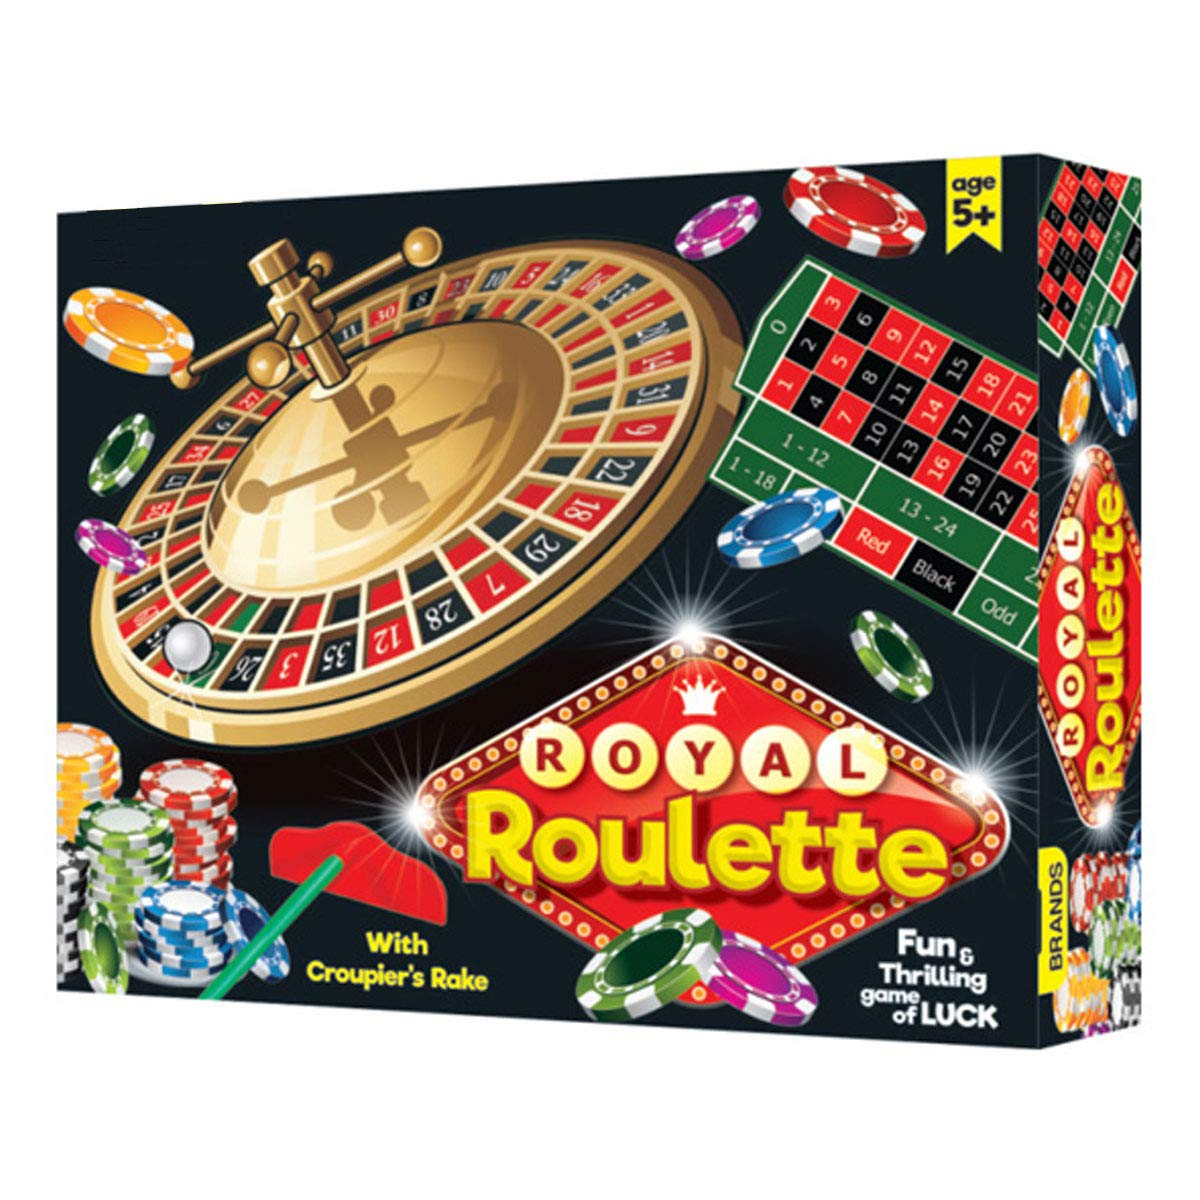 Croupier Roulette System